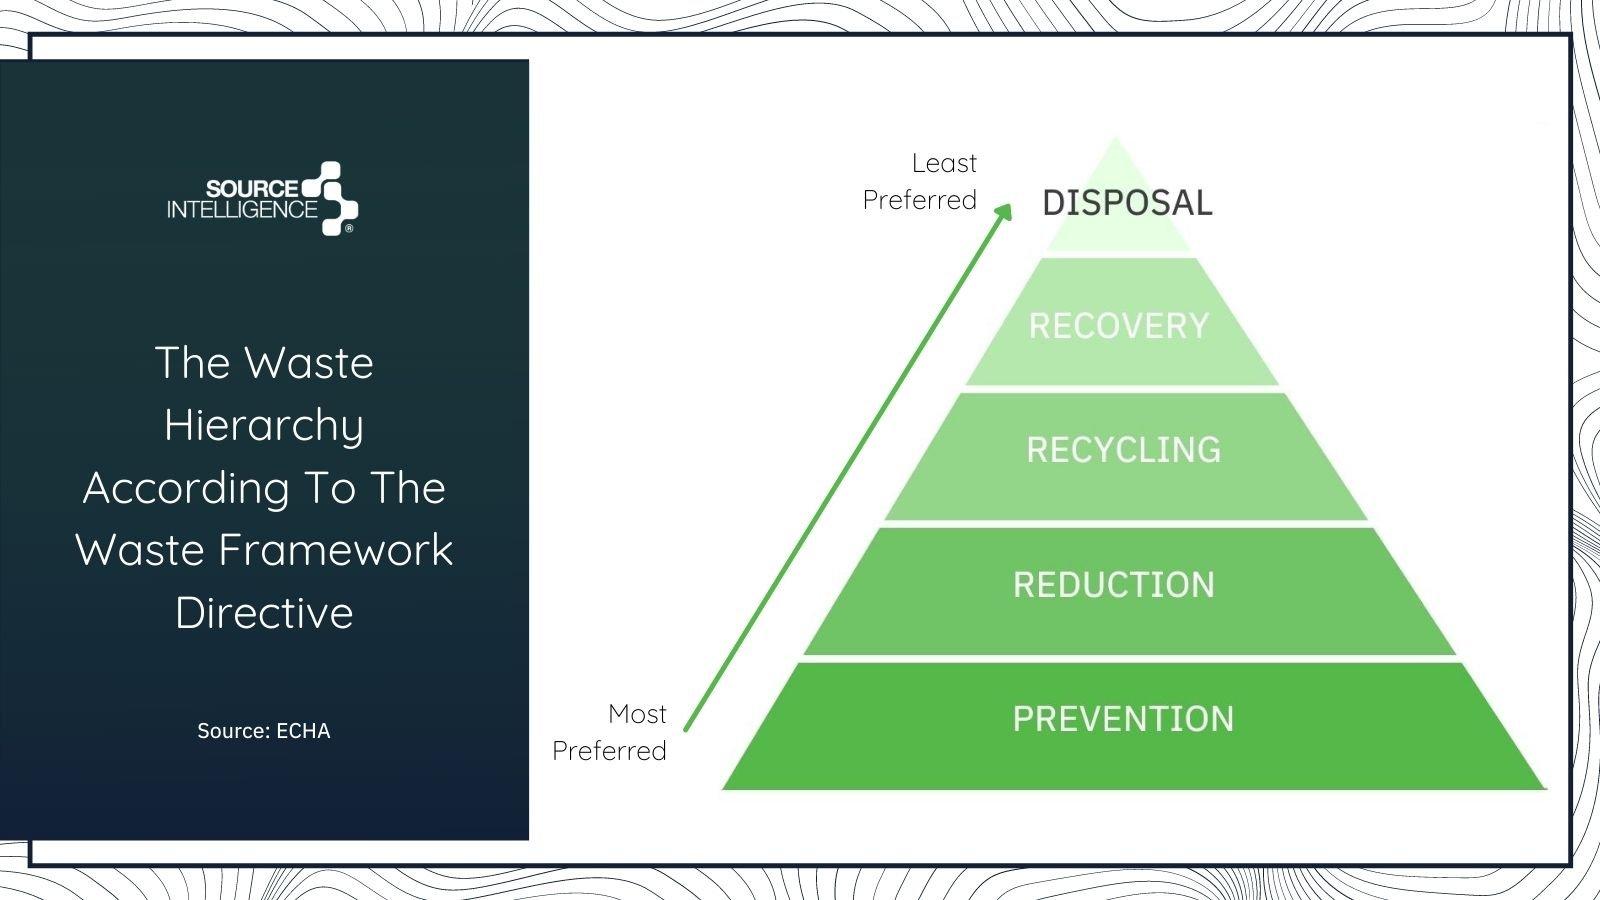 EU Waste Framework Directive Hierarchy